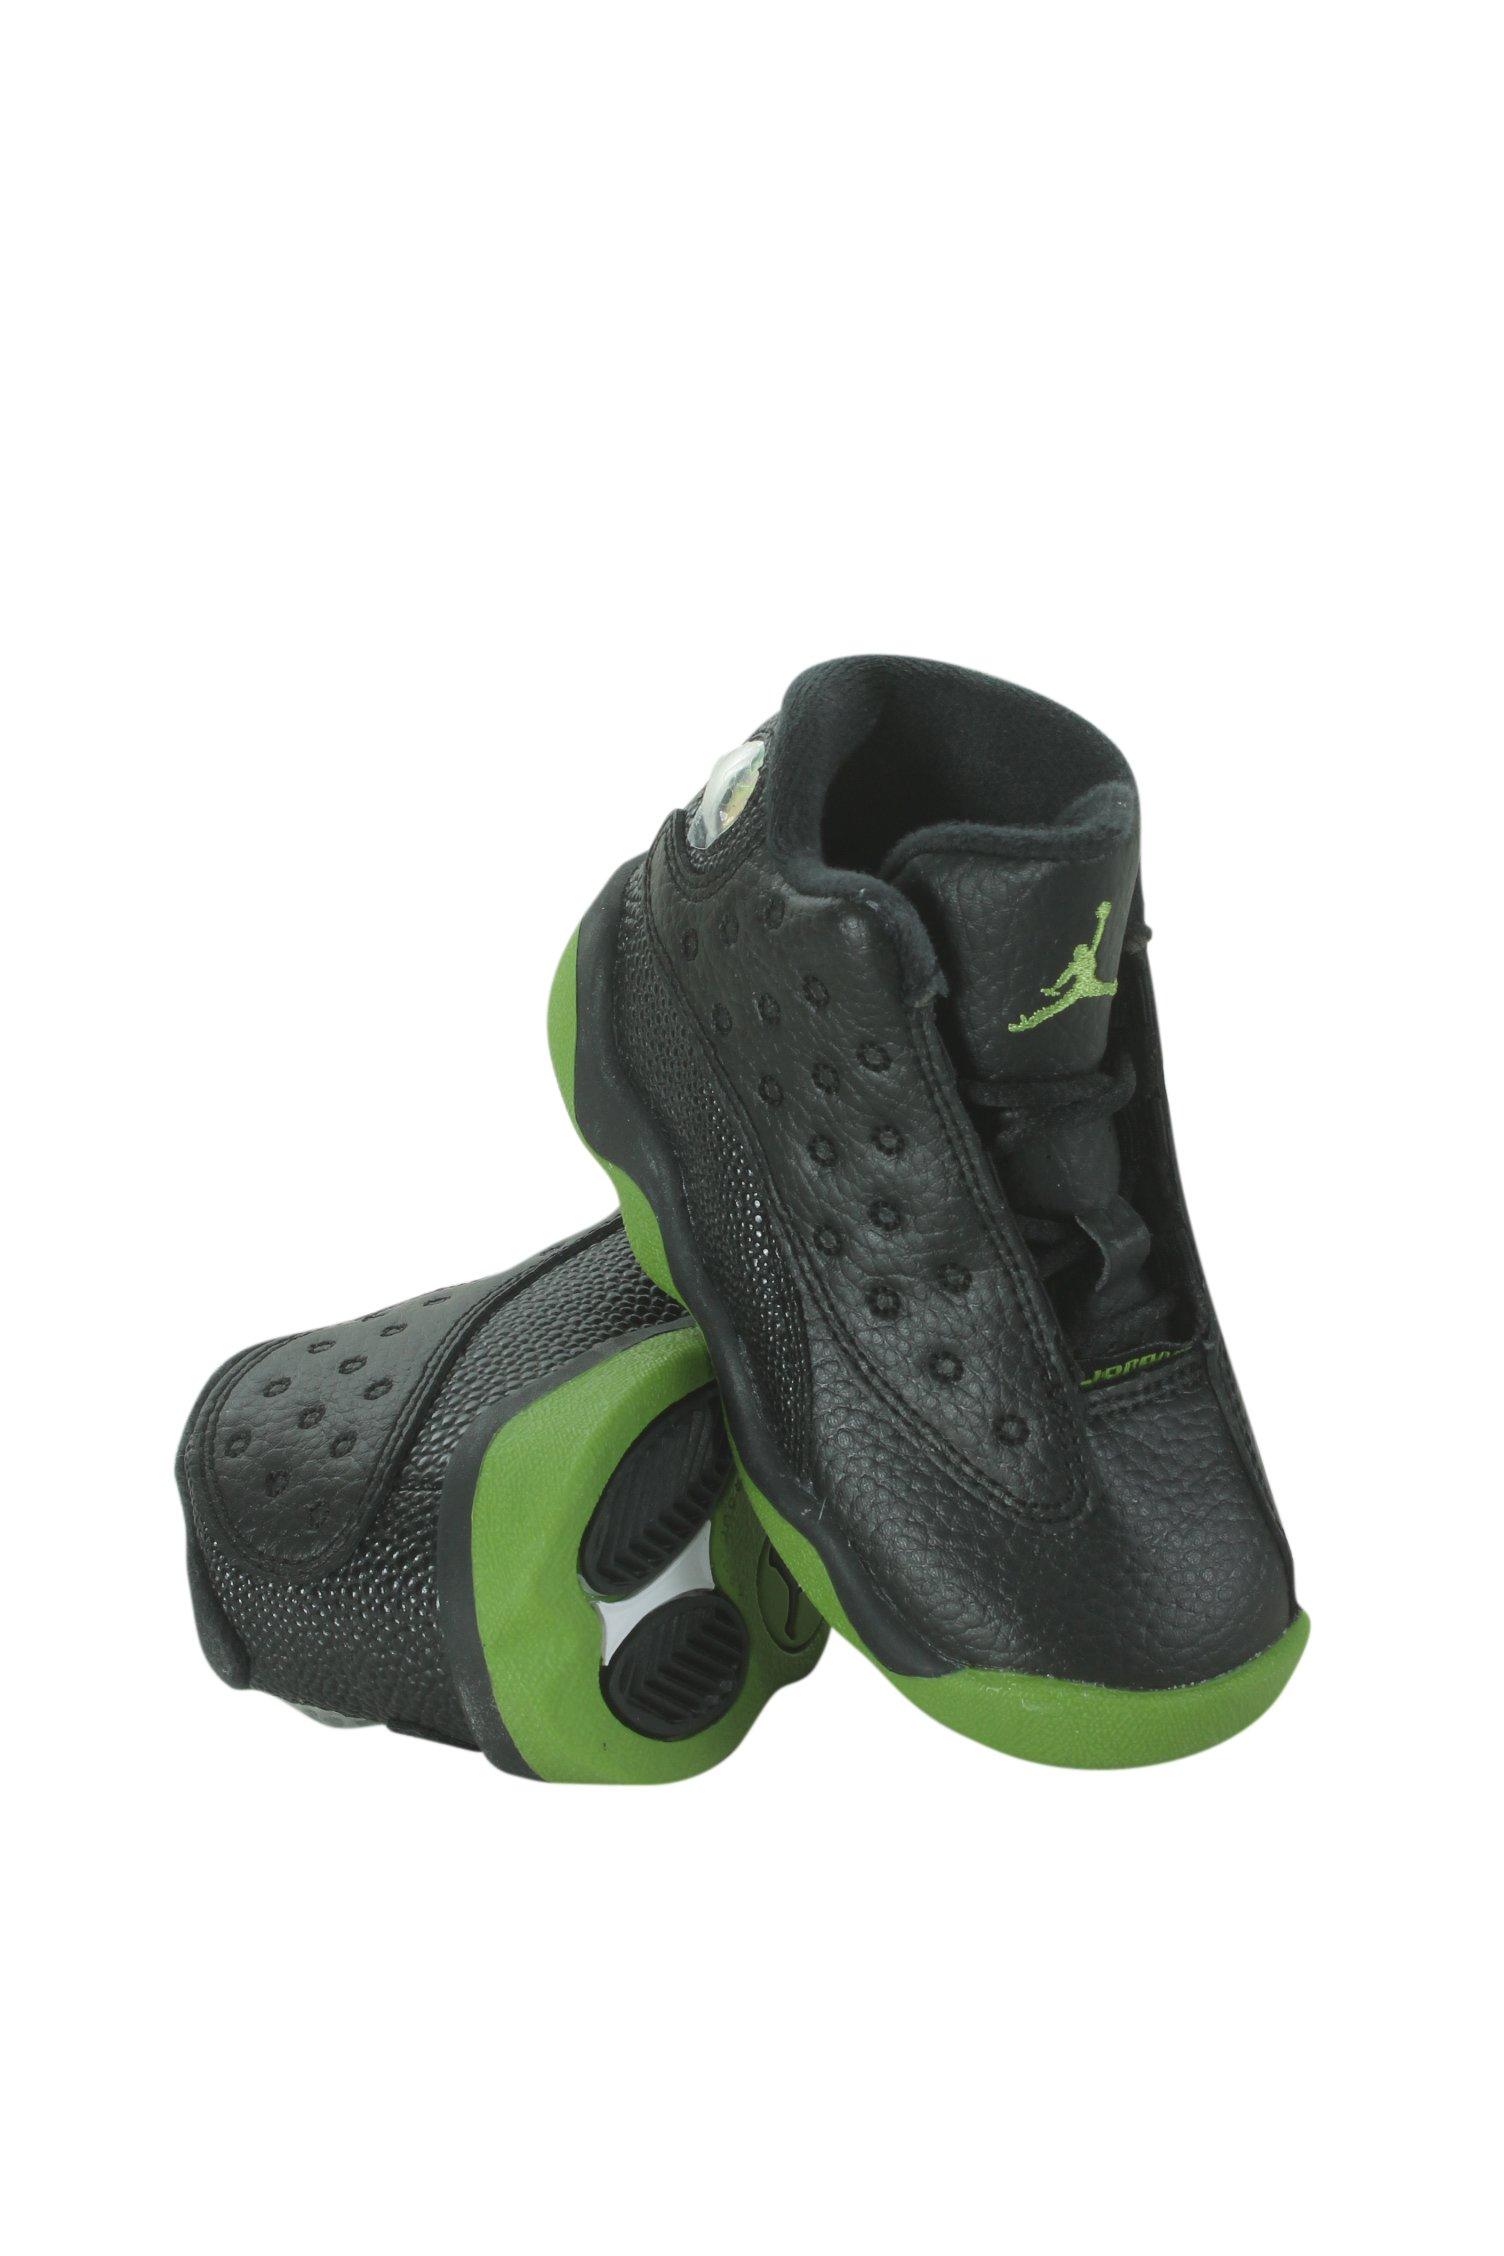 414581-042 Kids Toddler Jordan 13 Retro BT Jordan Black/Altitude Green-White